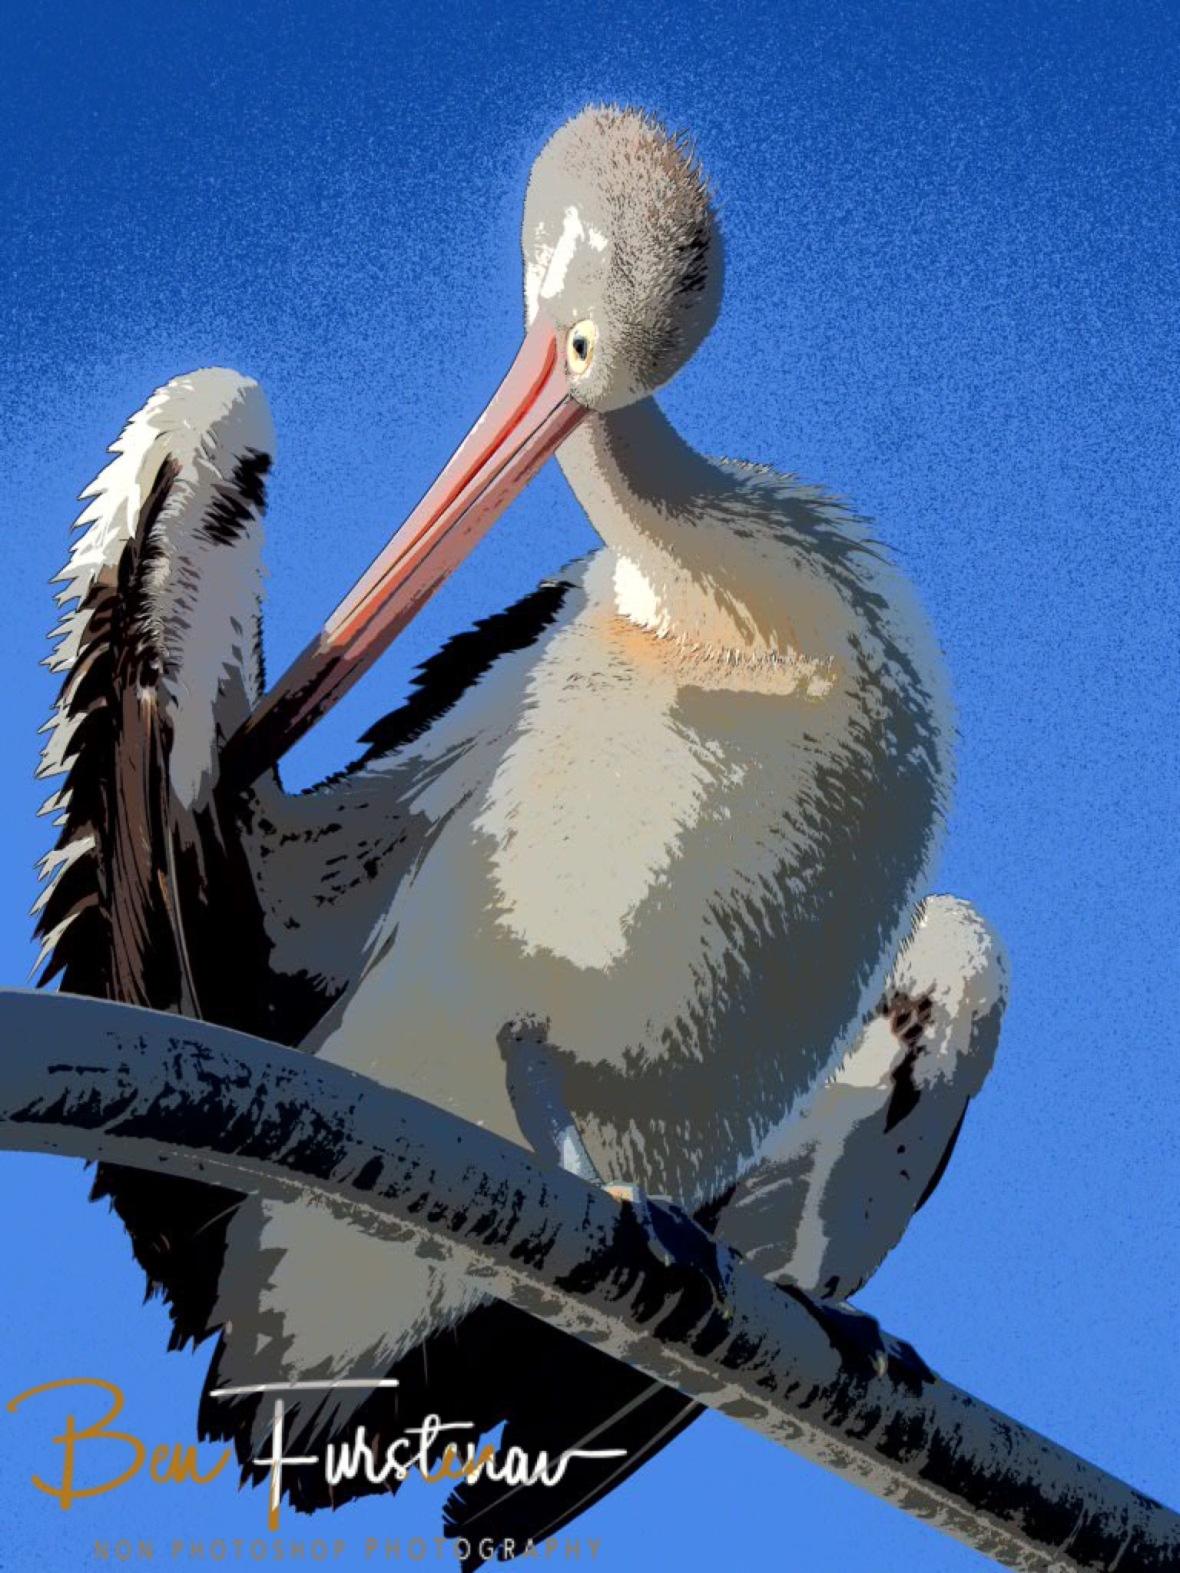 Neck-bending antics at Evans Head, Northern New South Wales, Australia